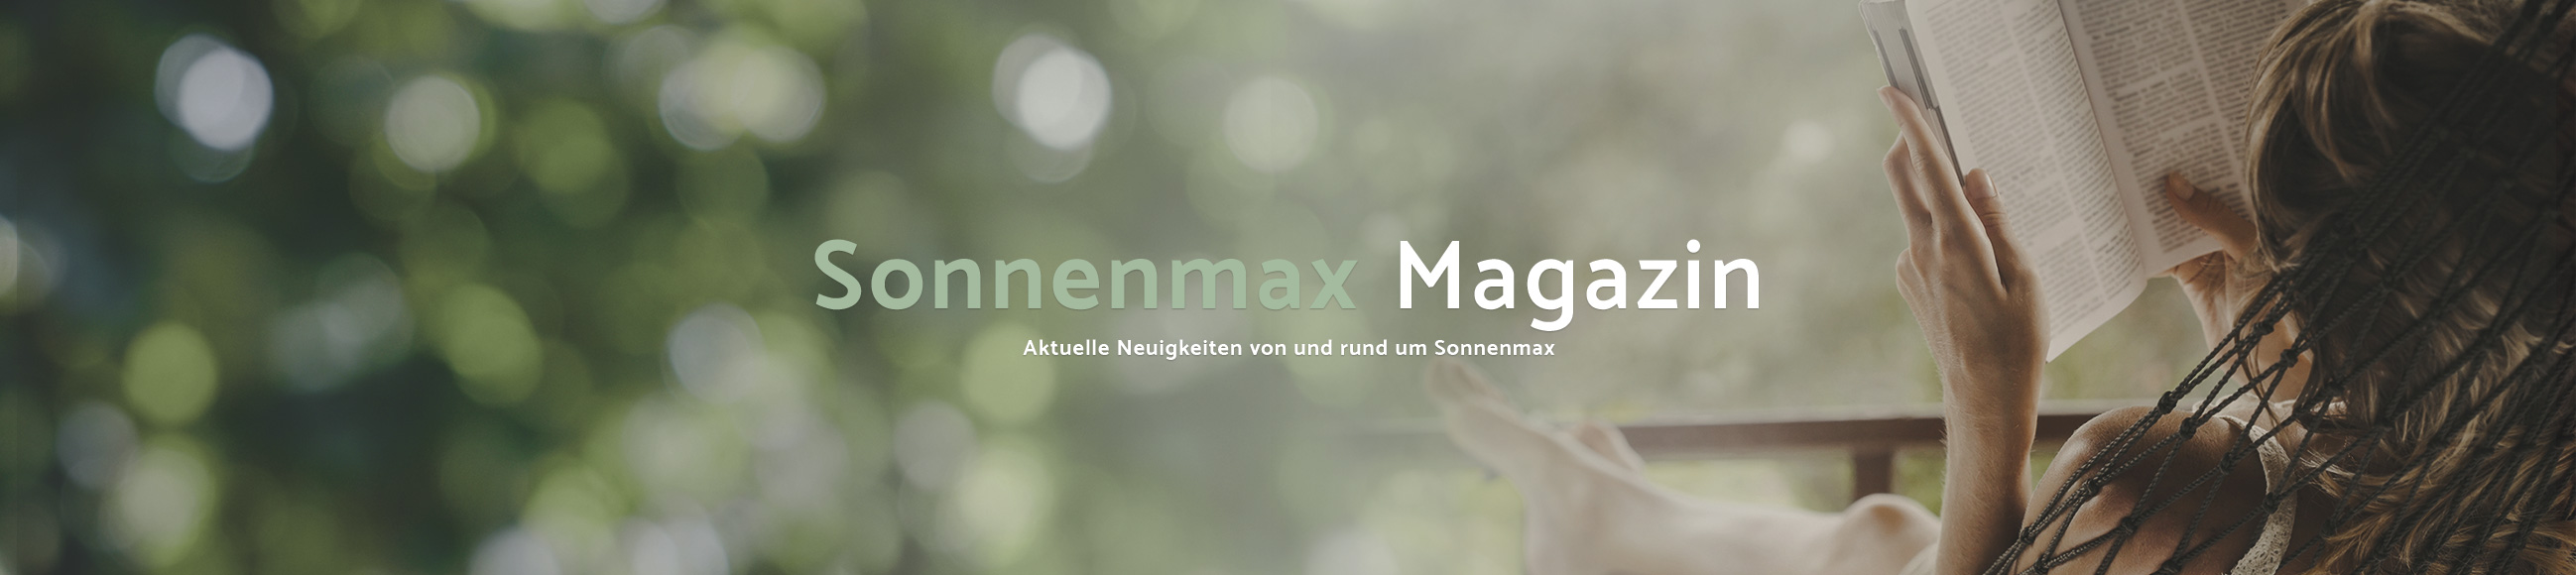 Sonnenmax-Magazin